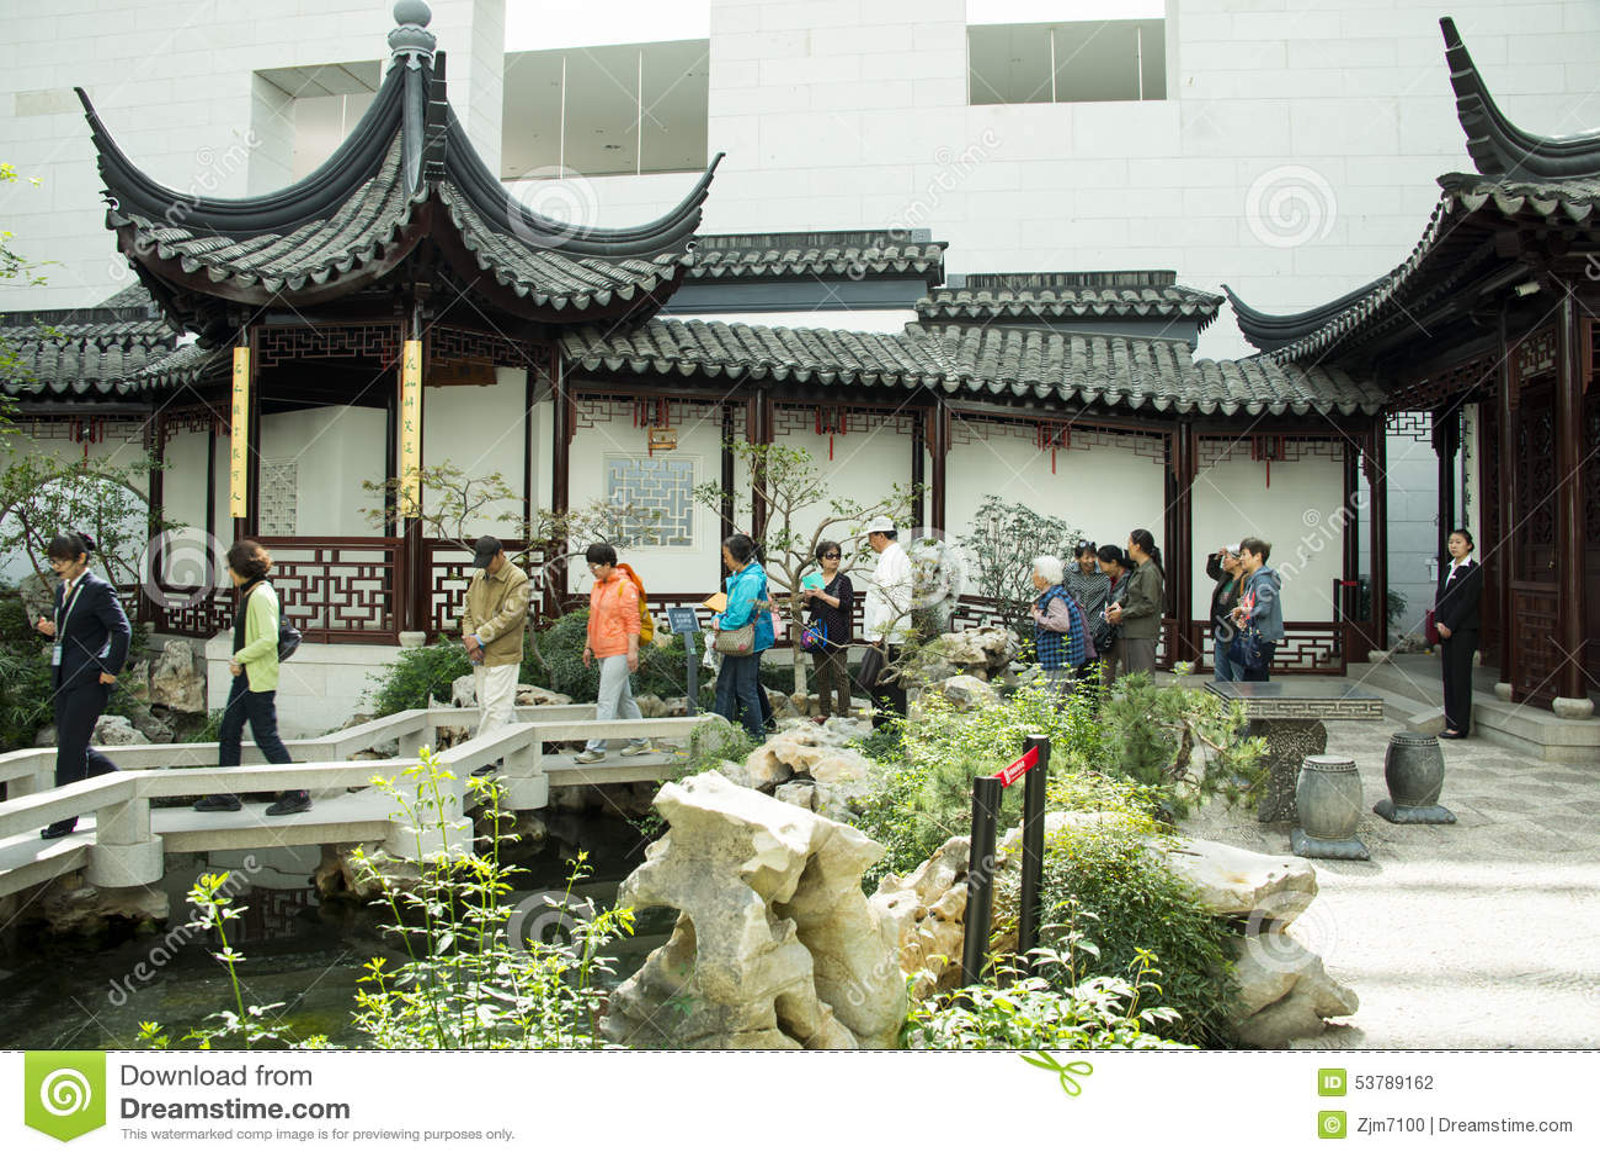 Asia Chinese Beijing China Garden Museum Indoor Courtyard Suzhou Jiangnan Editorial Photography Image Of Landscape Asia 53789162